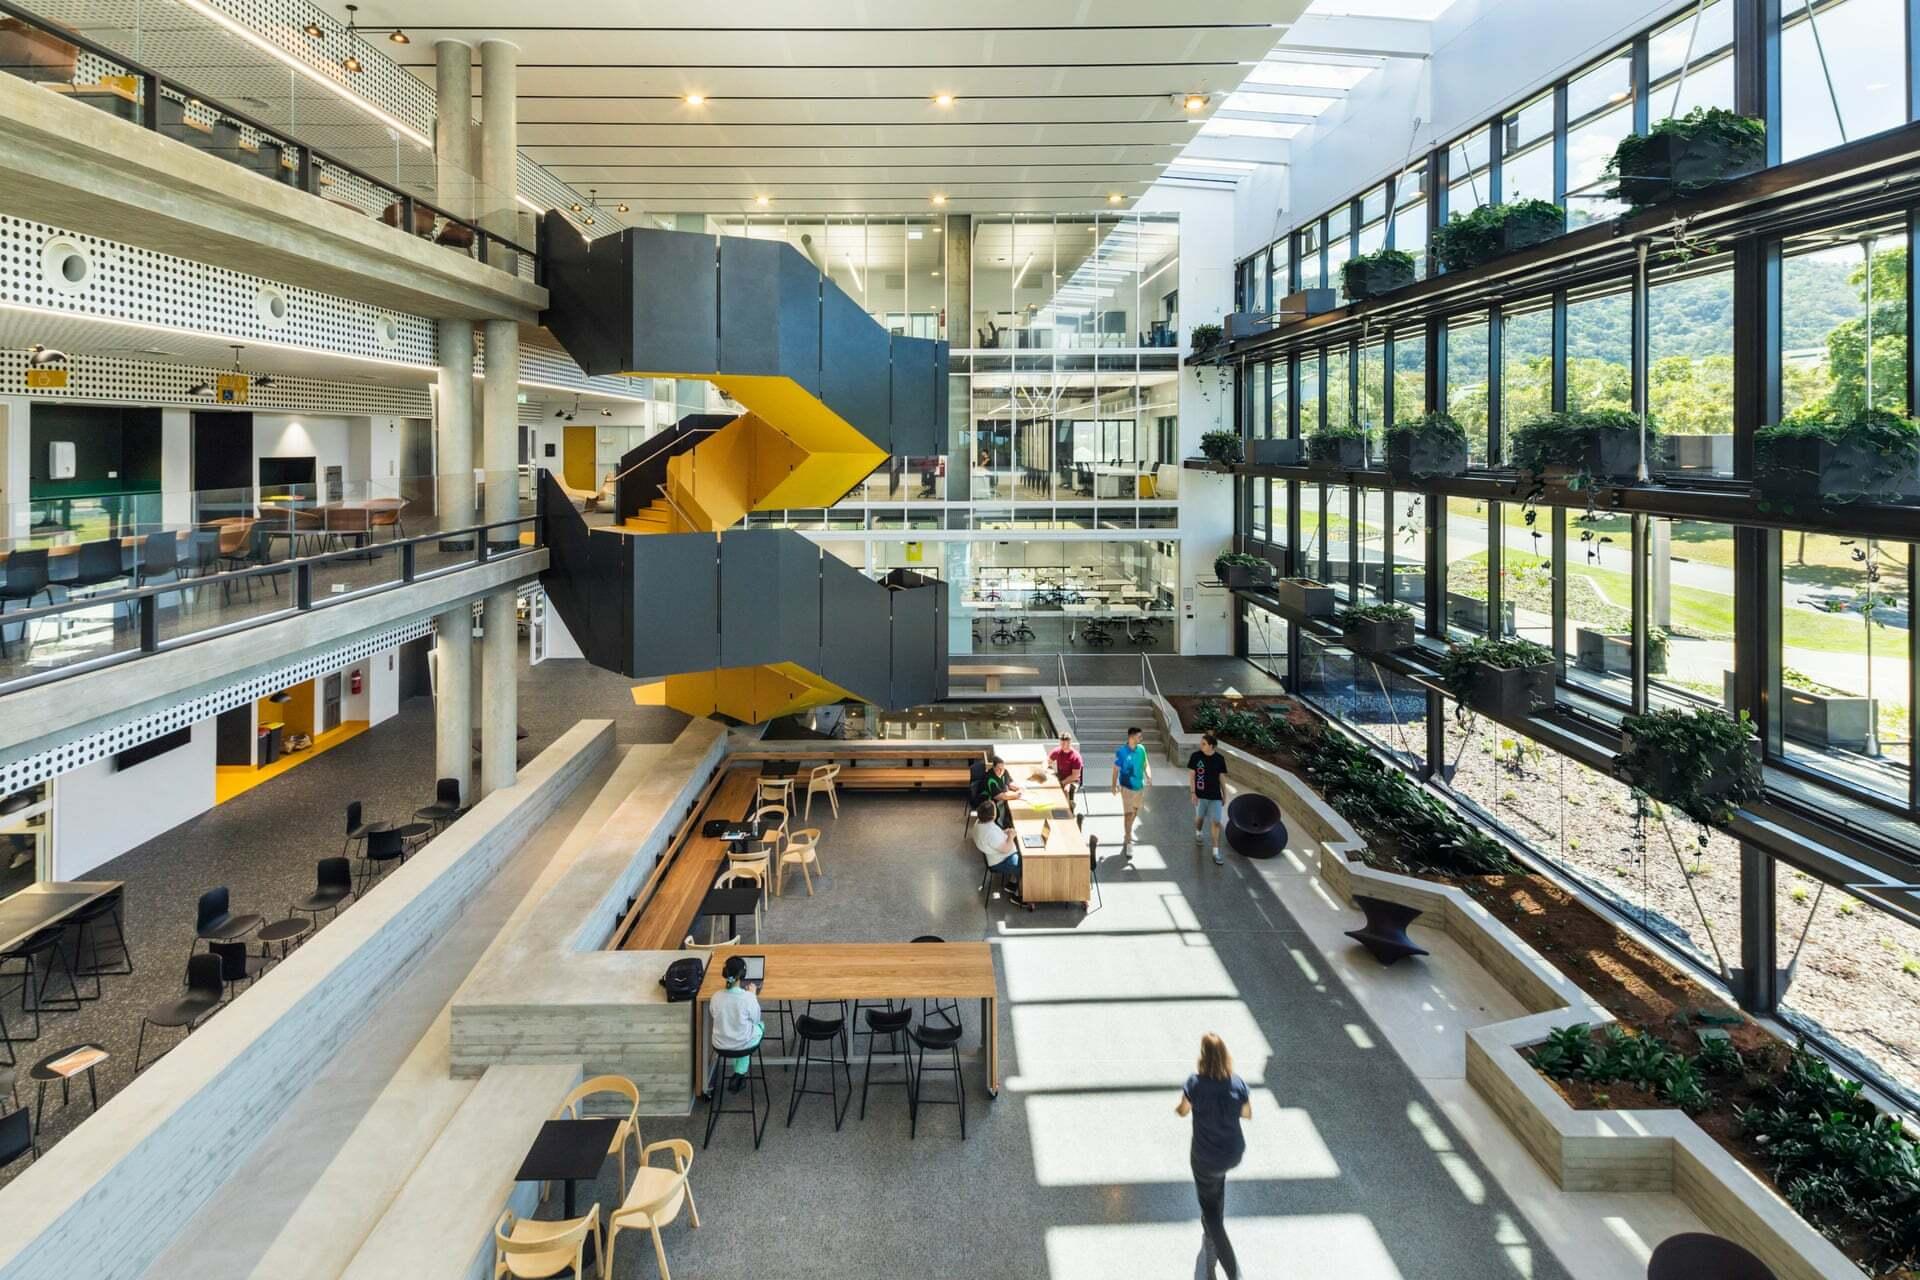 The James Cook University Ideas Lab in Australia